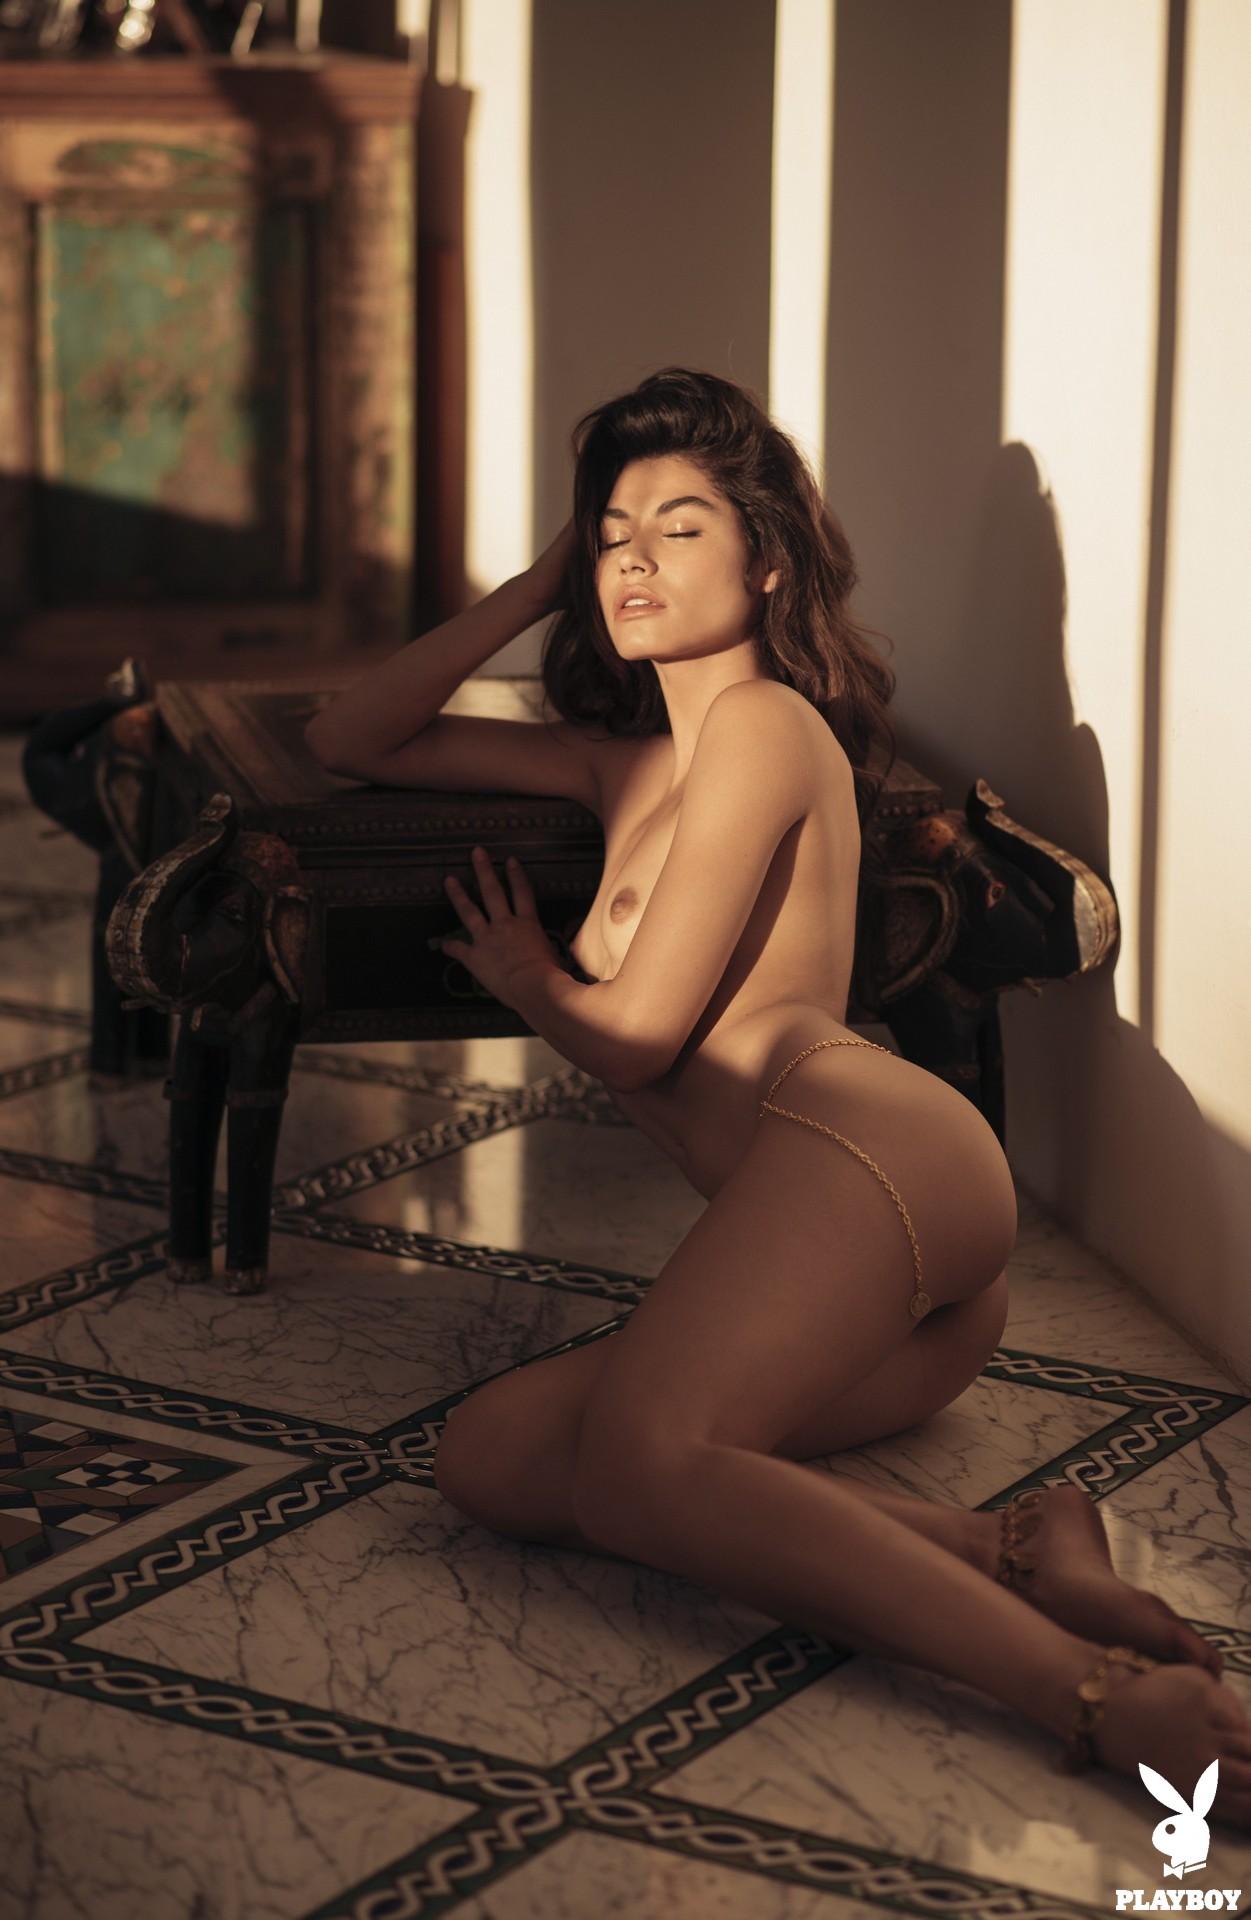 Playmate August 2018: Lorena Medina - Playboy Plus 13